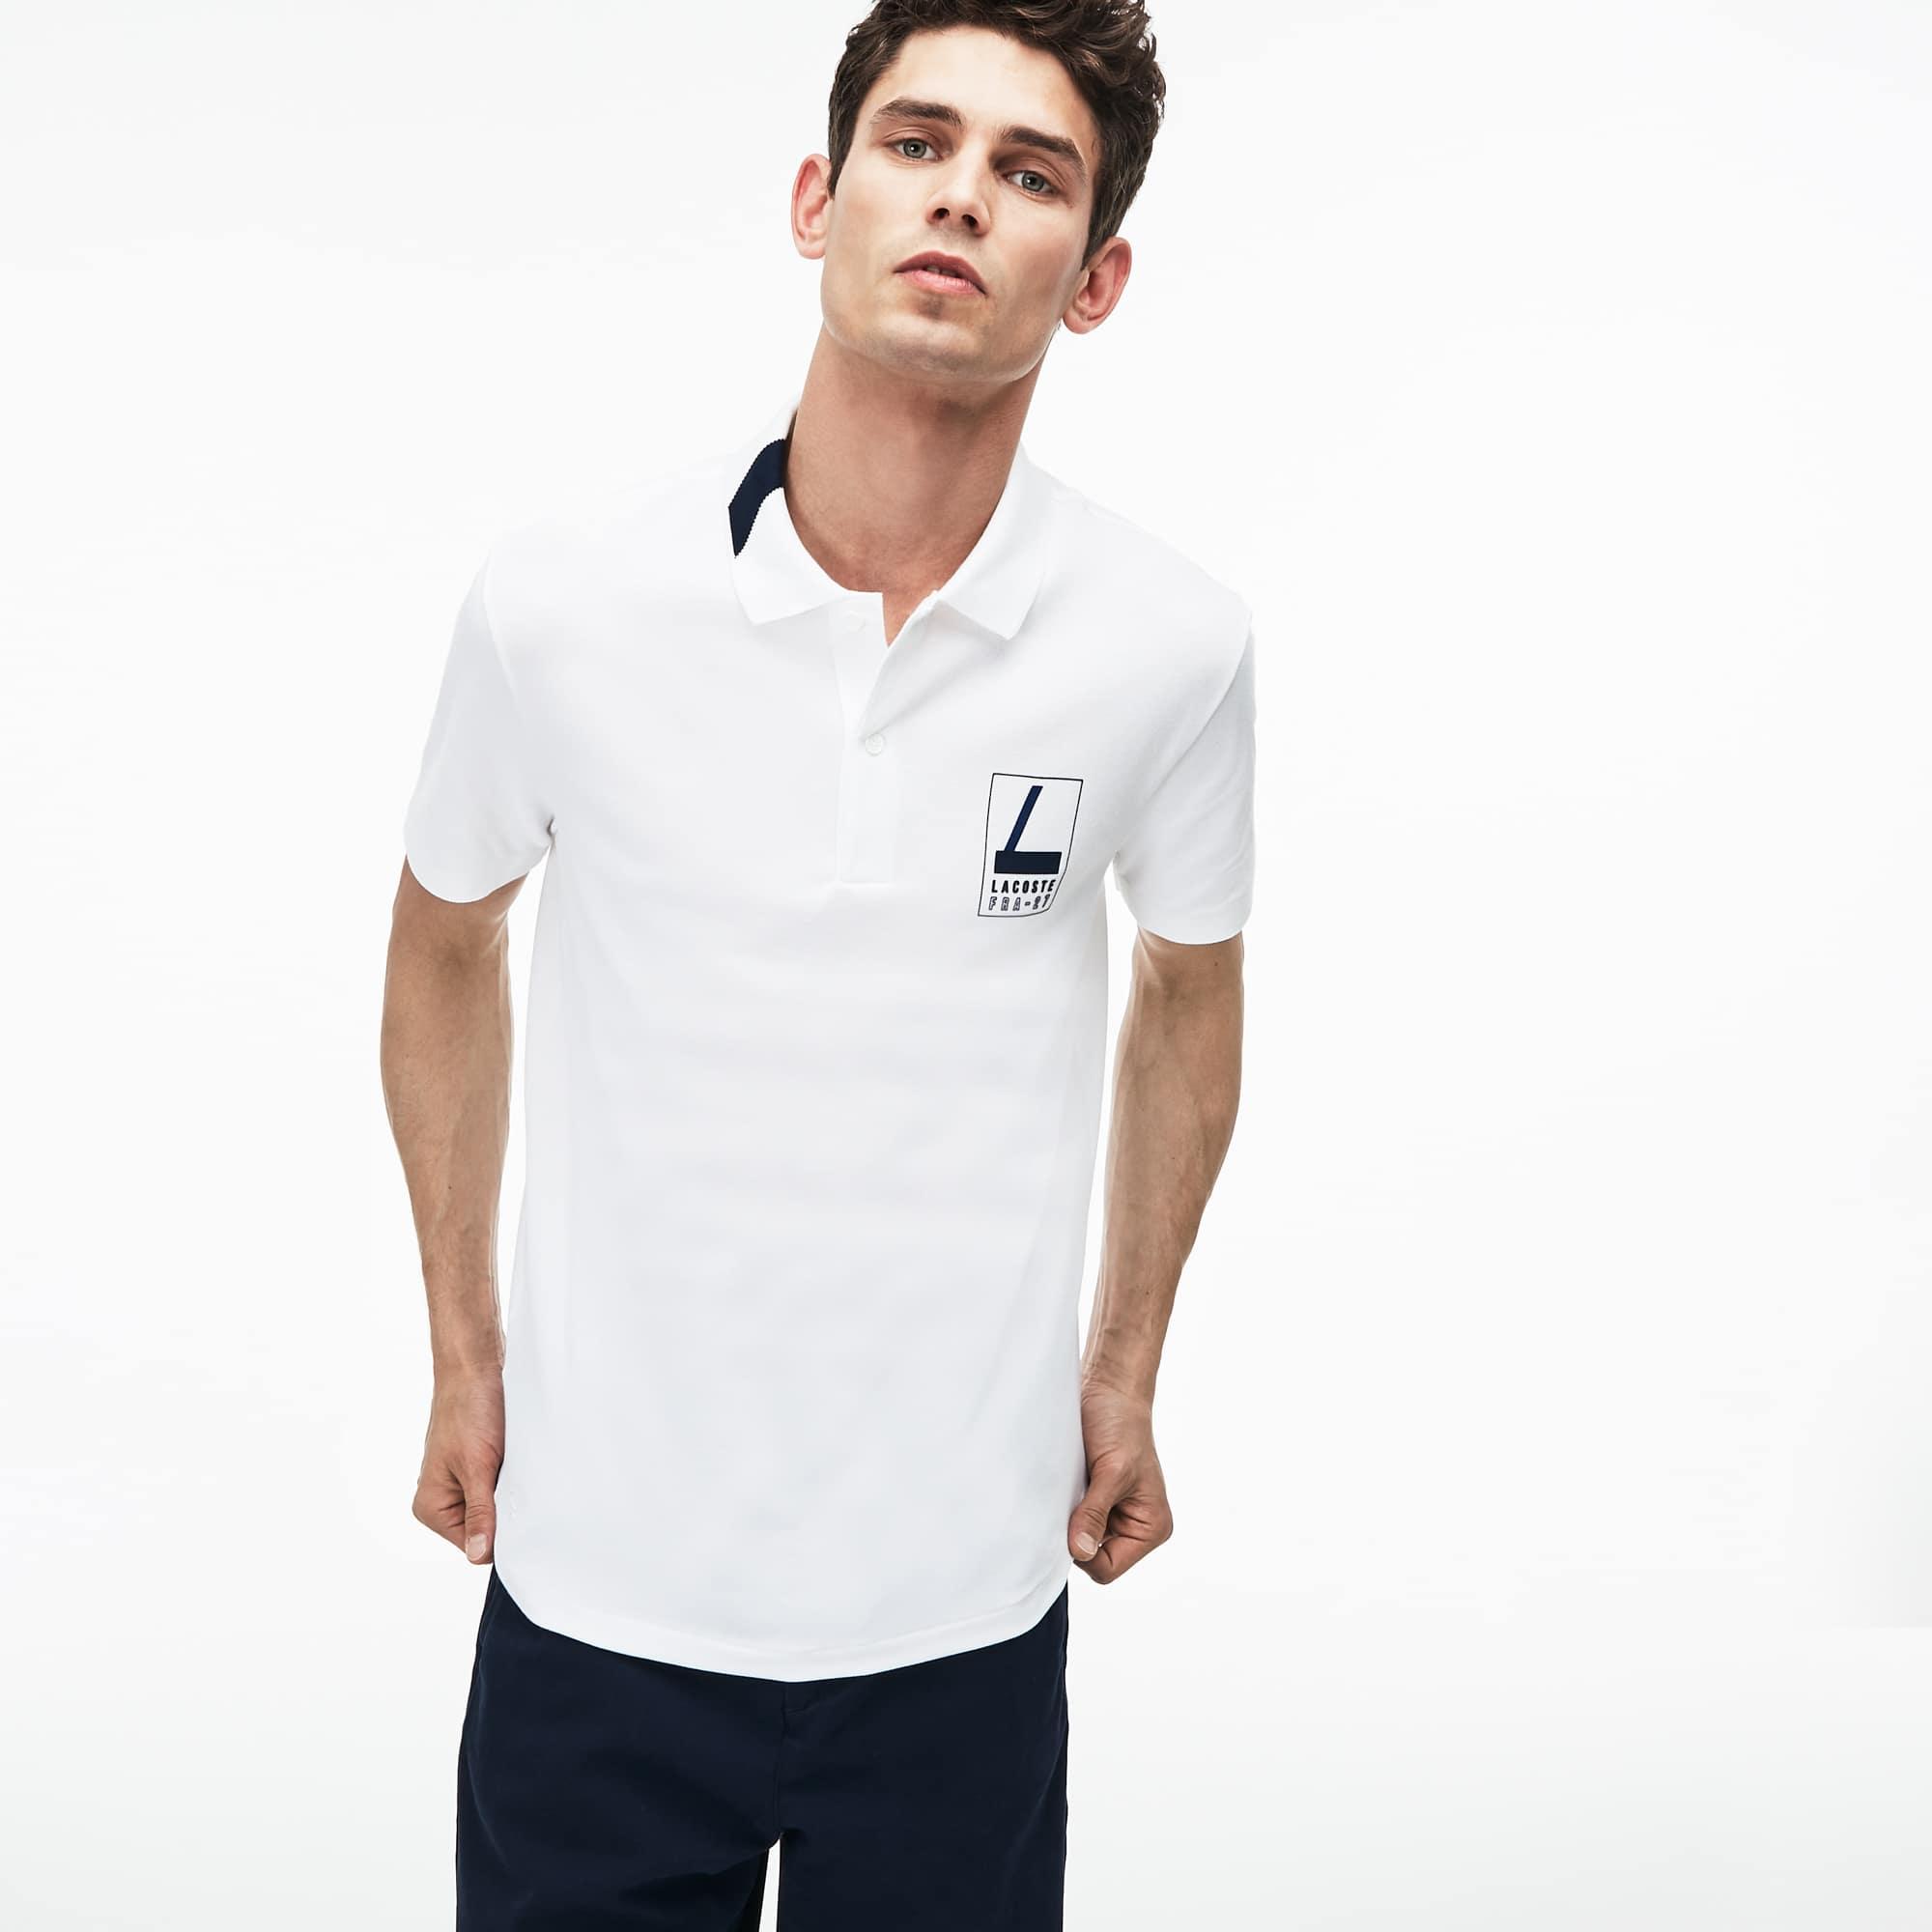 2866d9d6f96 Men s Clothing